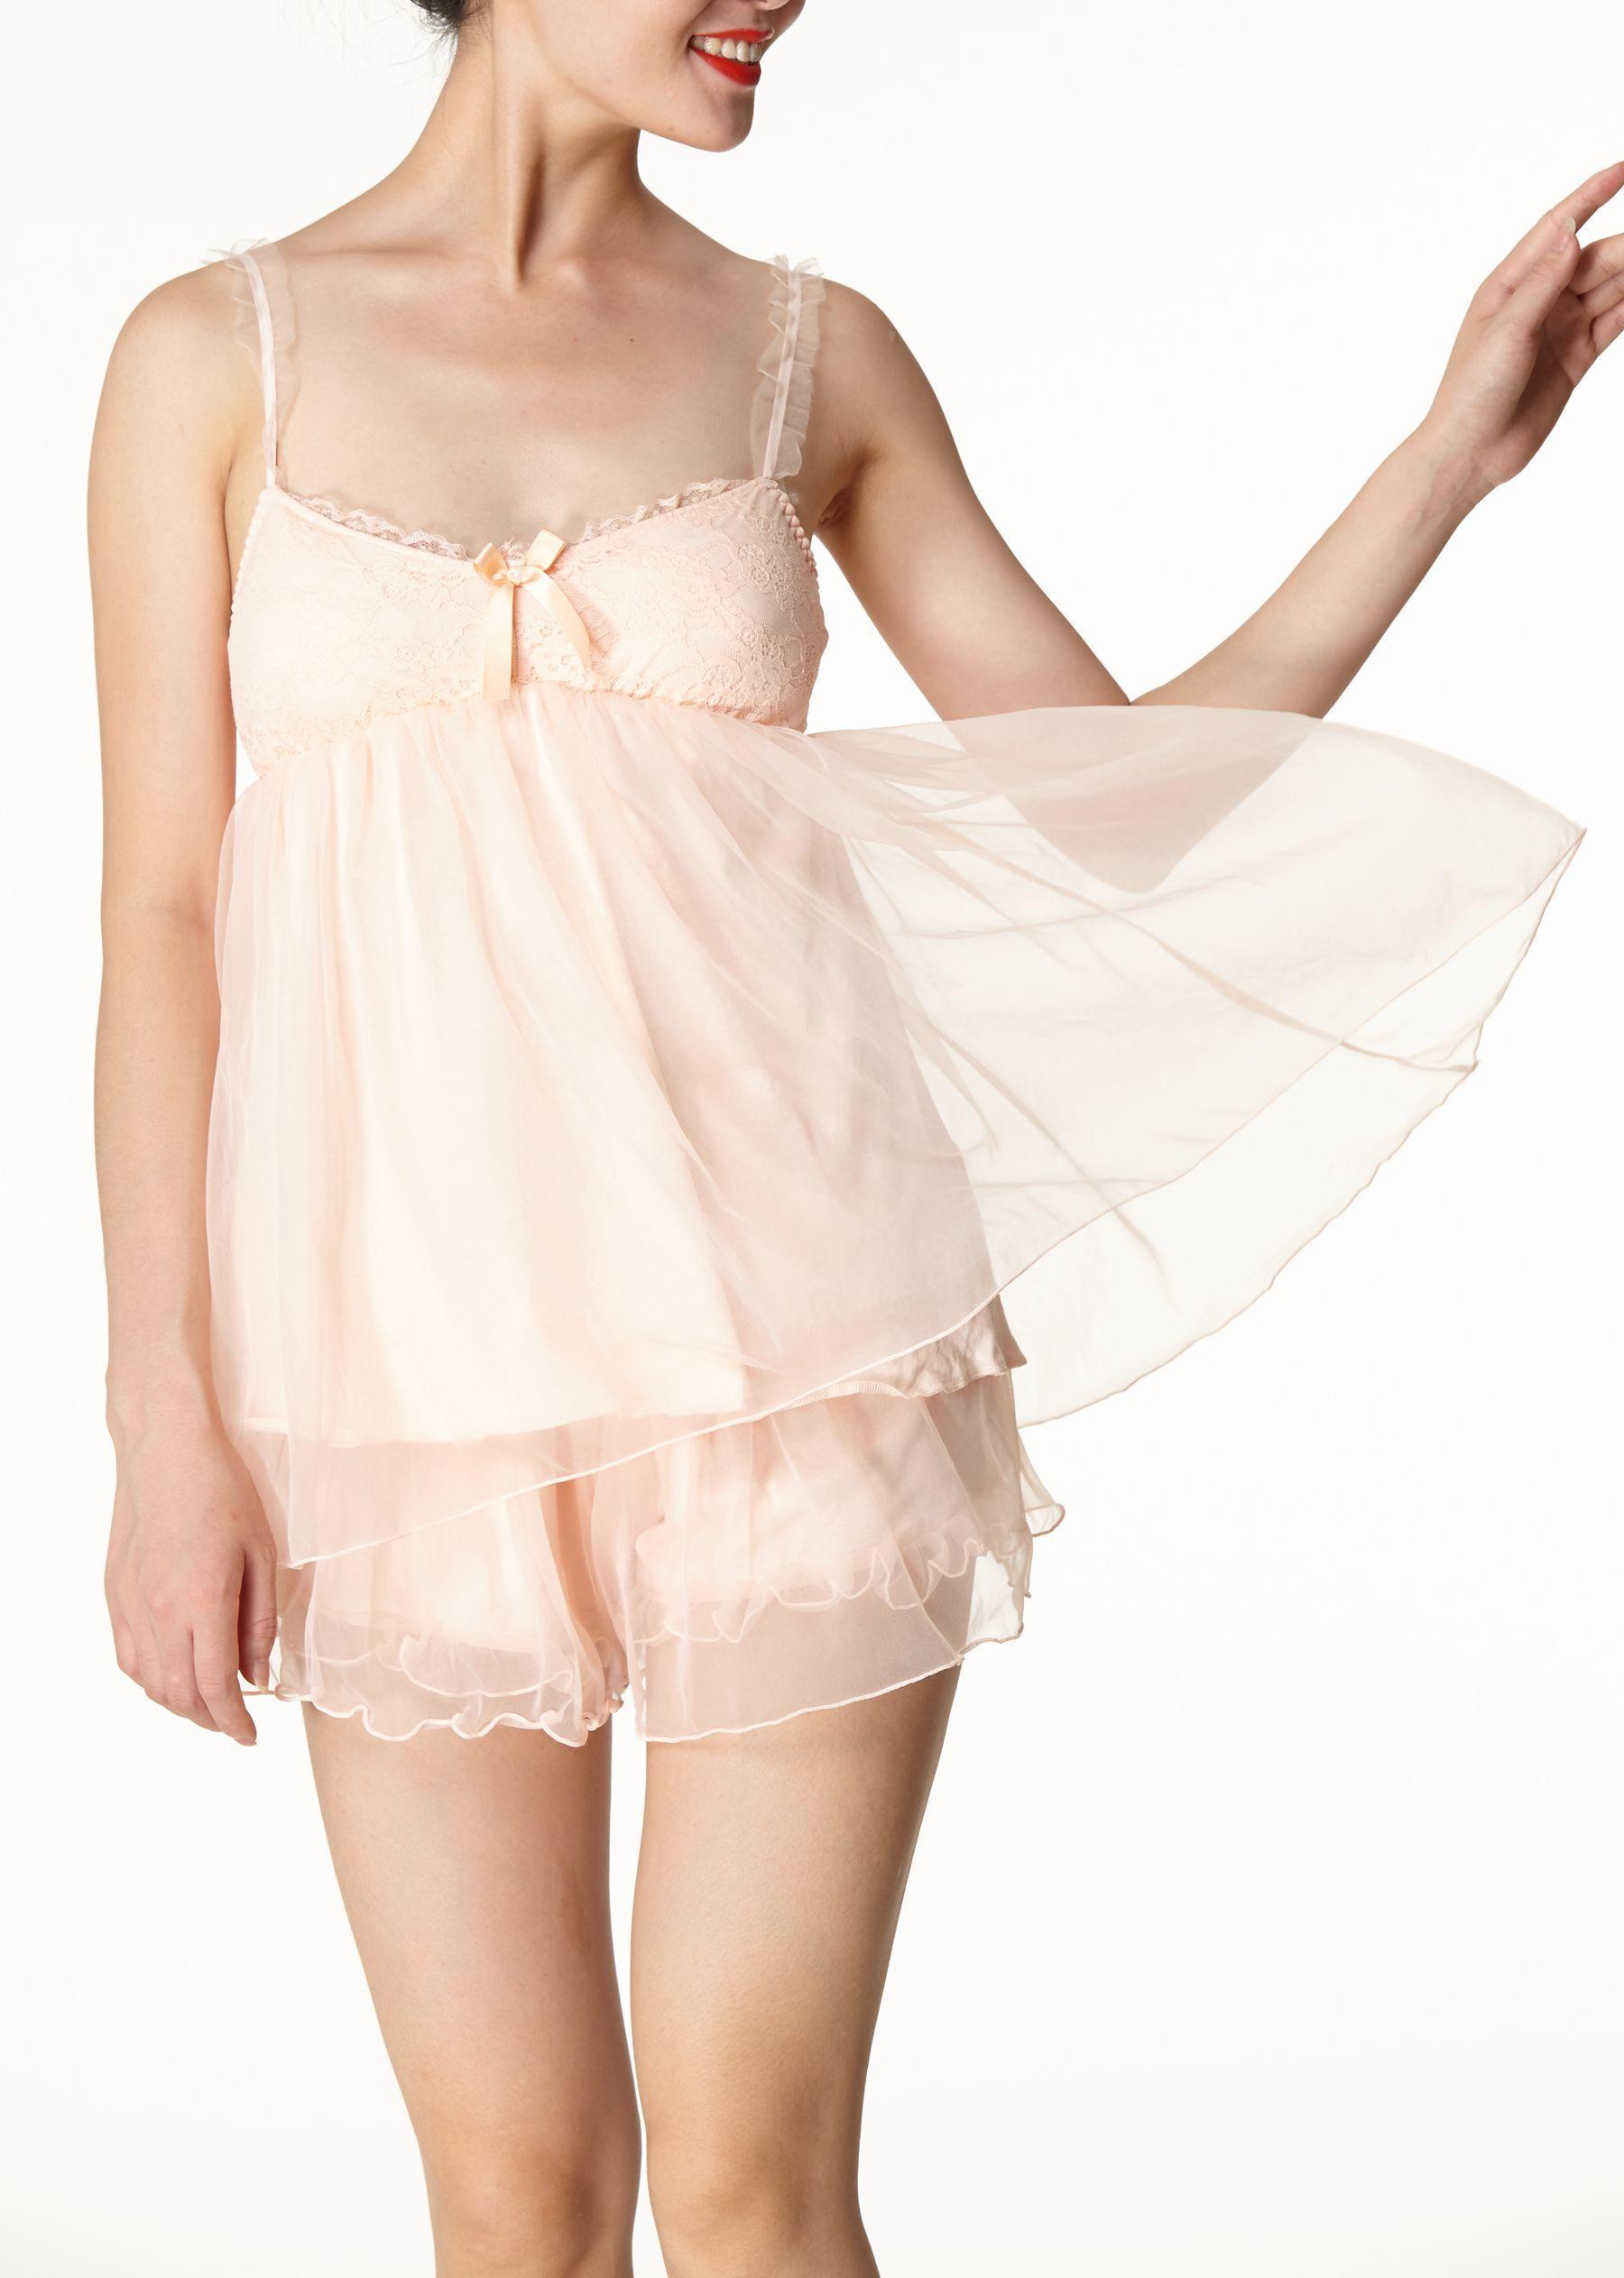 Ms Demon Set Dreamlike Suspender Two Piece Suit Wedding Nightclothes Pink Size 2 12free